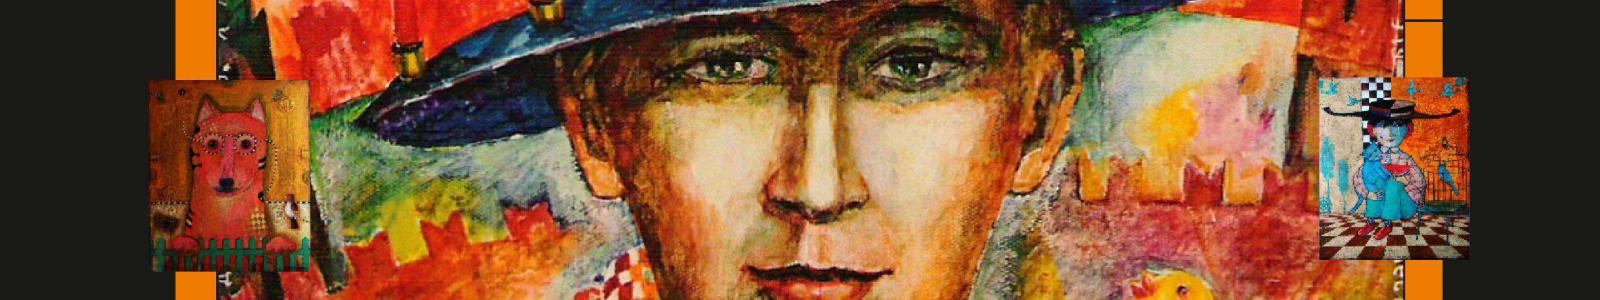 Gallery Painter Valentin Chugaev